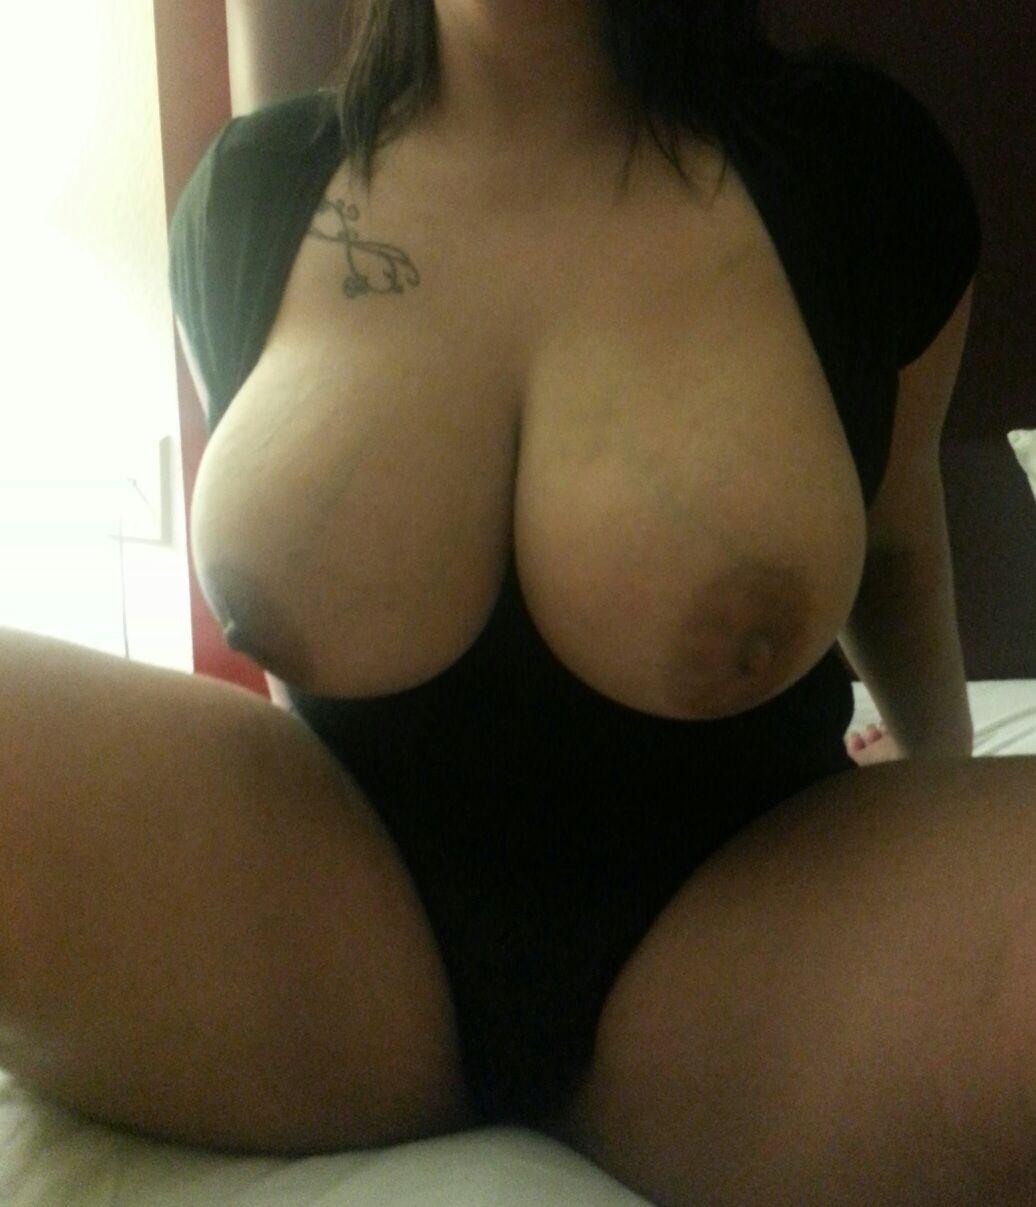 giada de laurentiis only fake nude pics